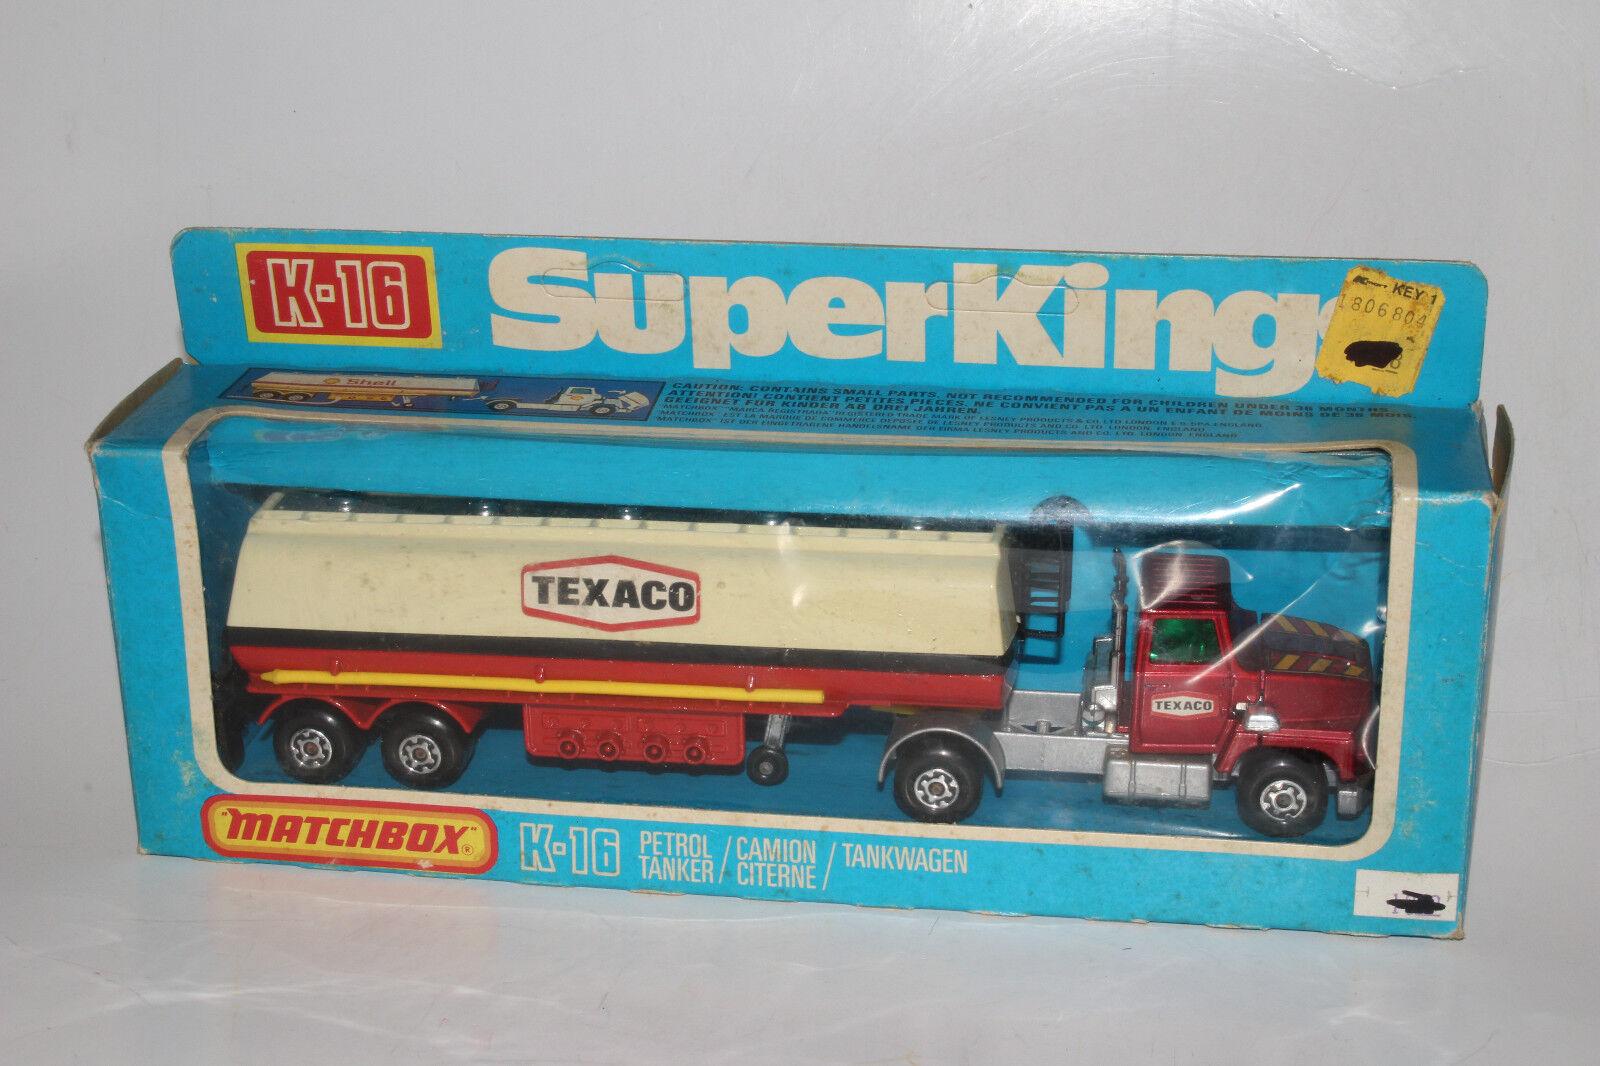 Matchbox Super Rois K-16 Ford Lts Articulé Camion Citerne, Jaune Grille, Boîte 2